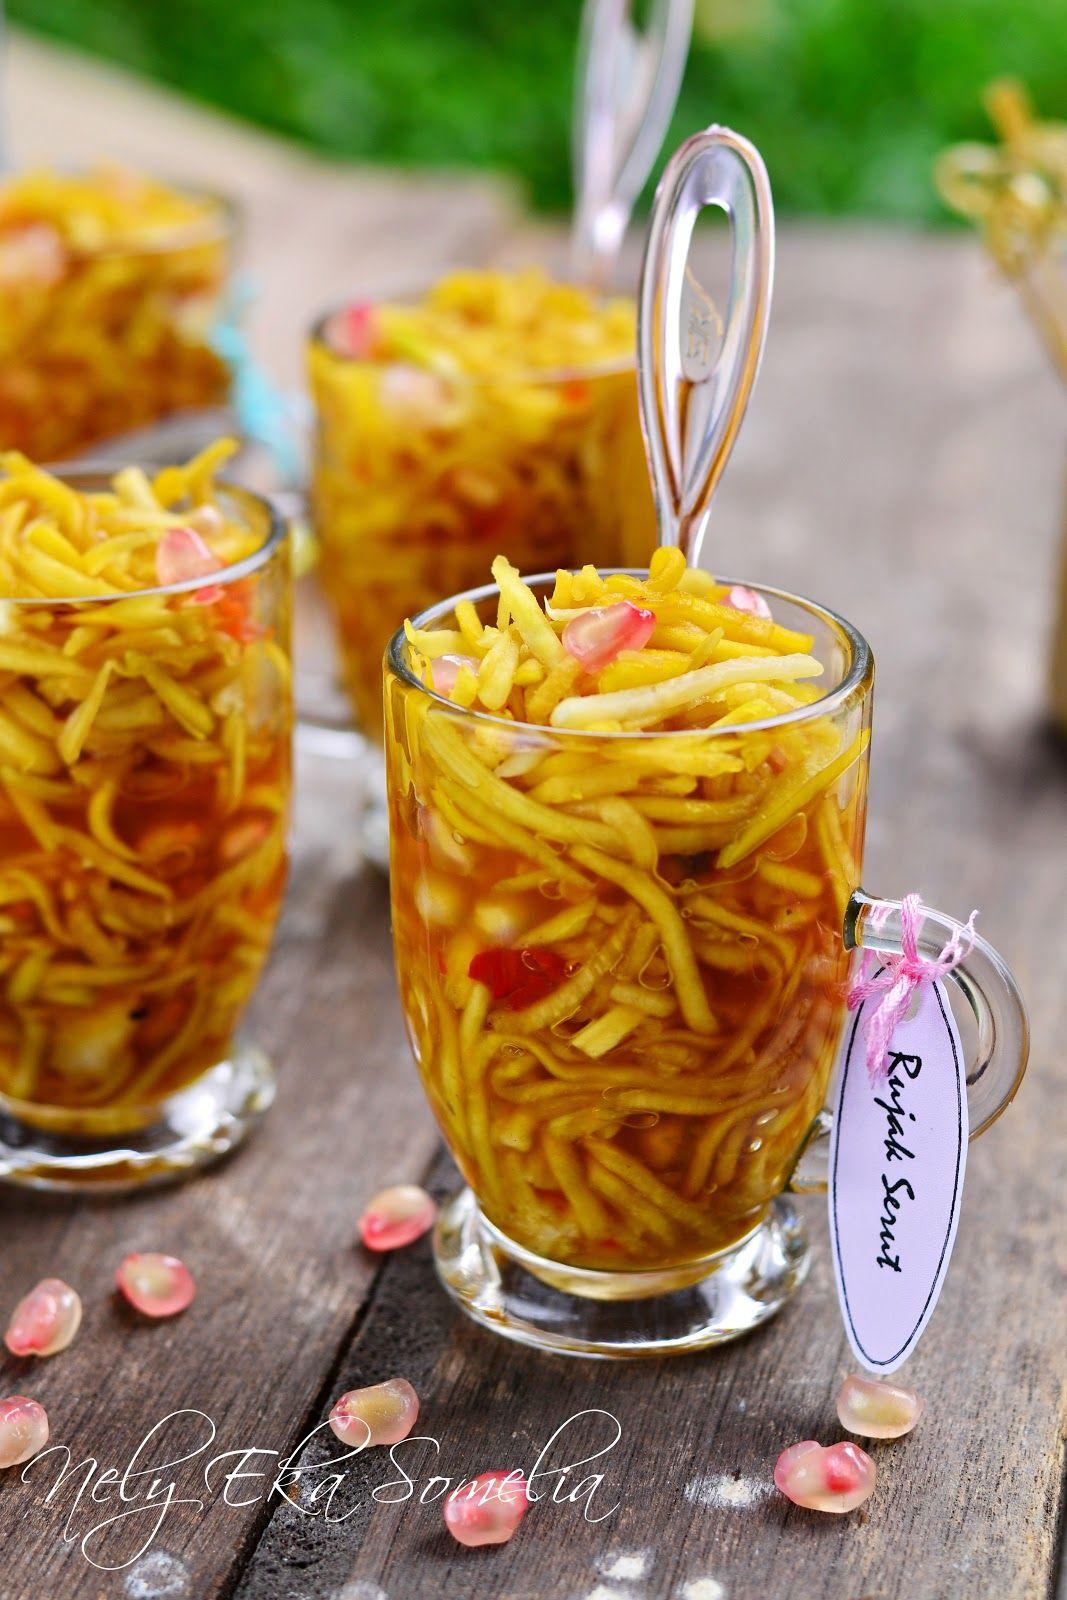 Sae Salera Januari 2013 Makanan Dan Minuman Ide Makanan Makanan